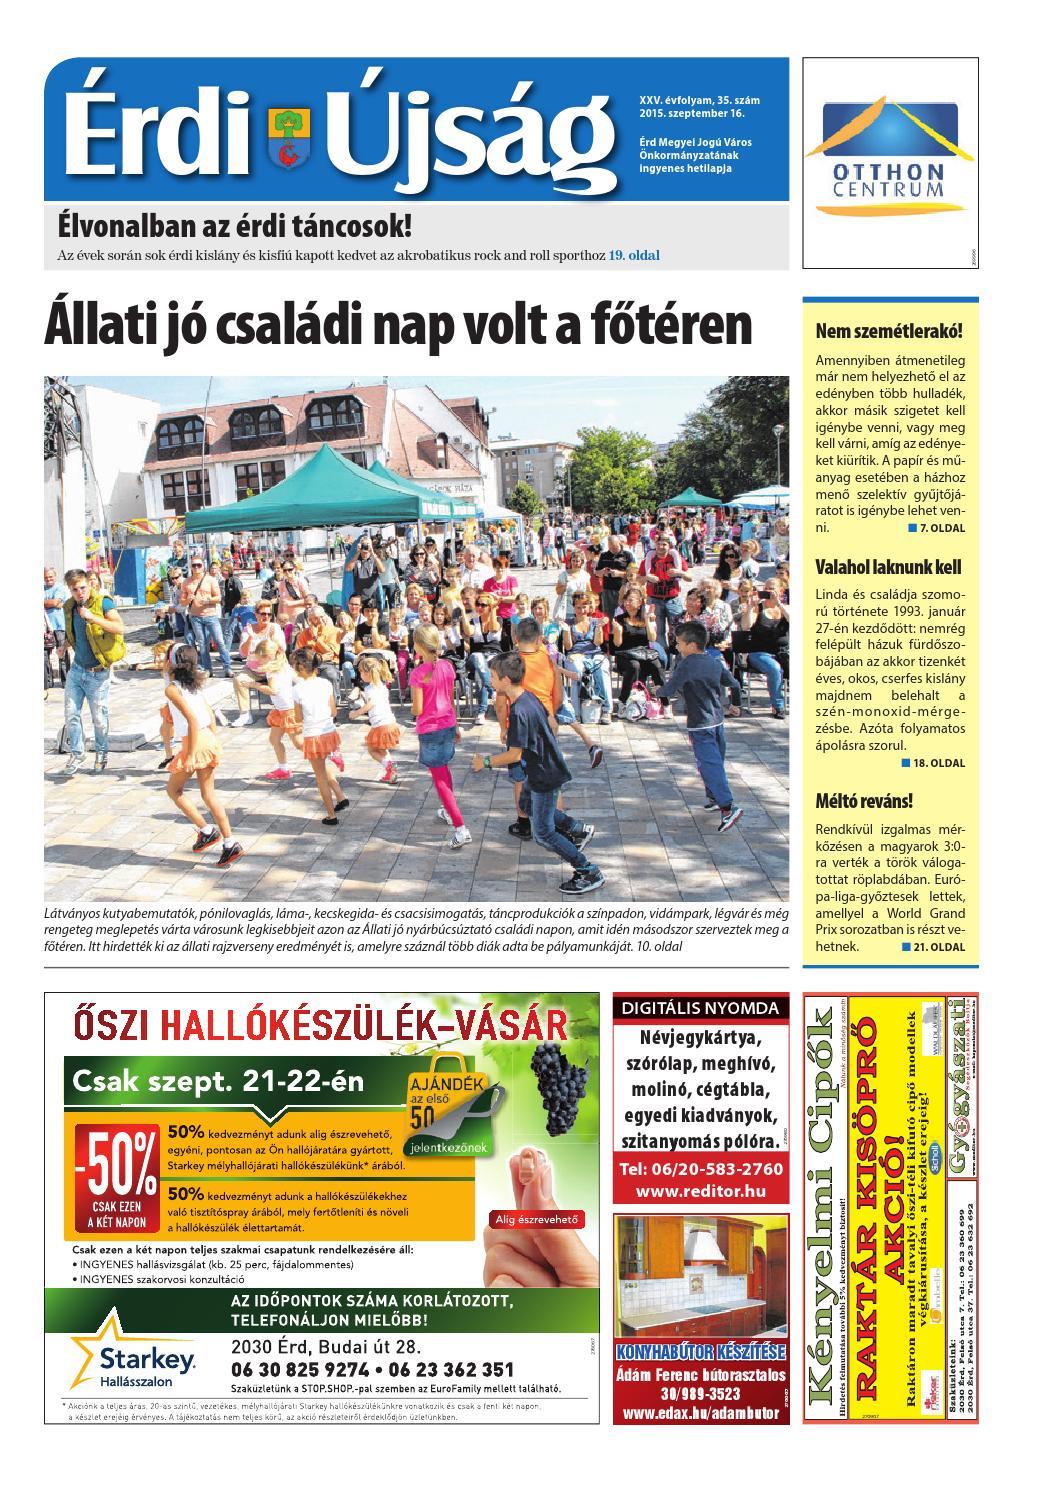 Érdi Újság - 2015. 09. 16. by Maraton Lapcsoport Kft. - issuu e88e89c54d